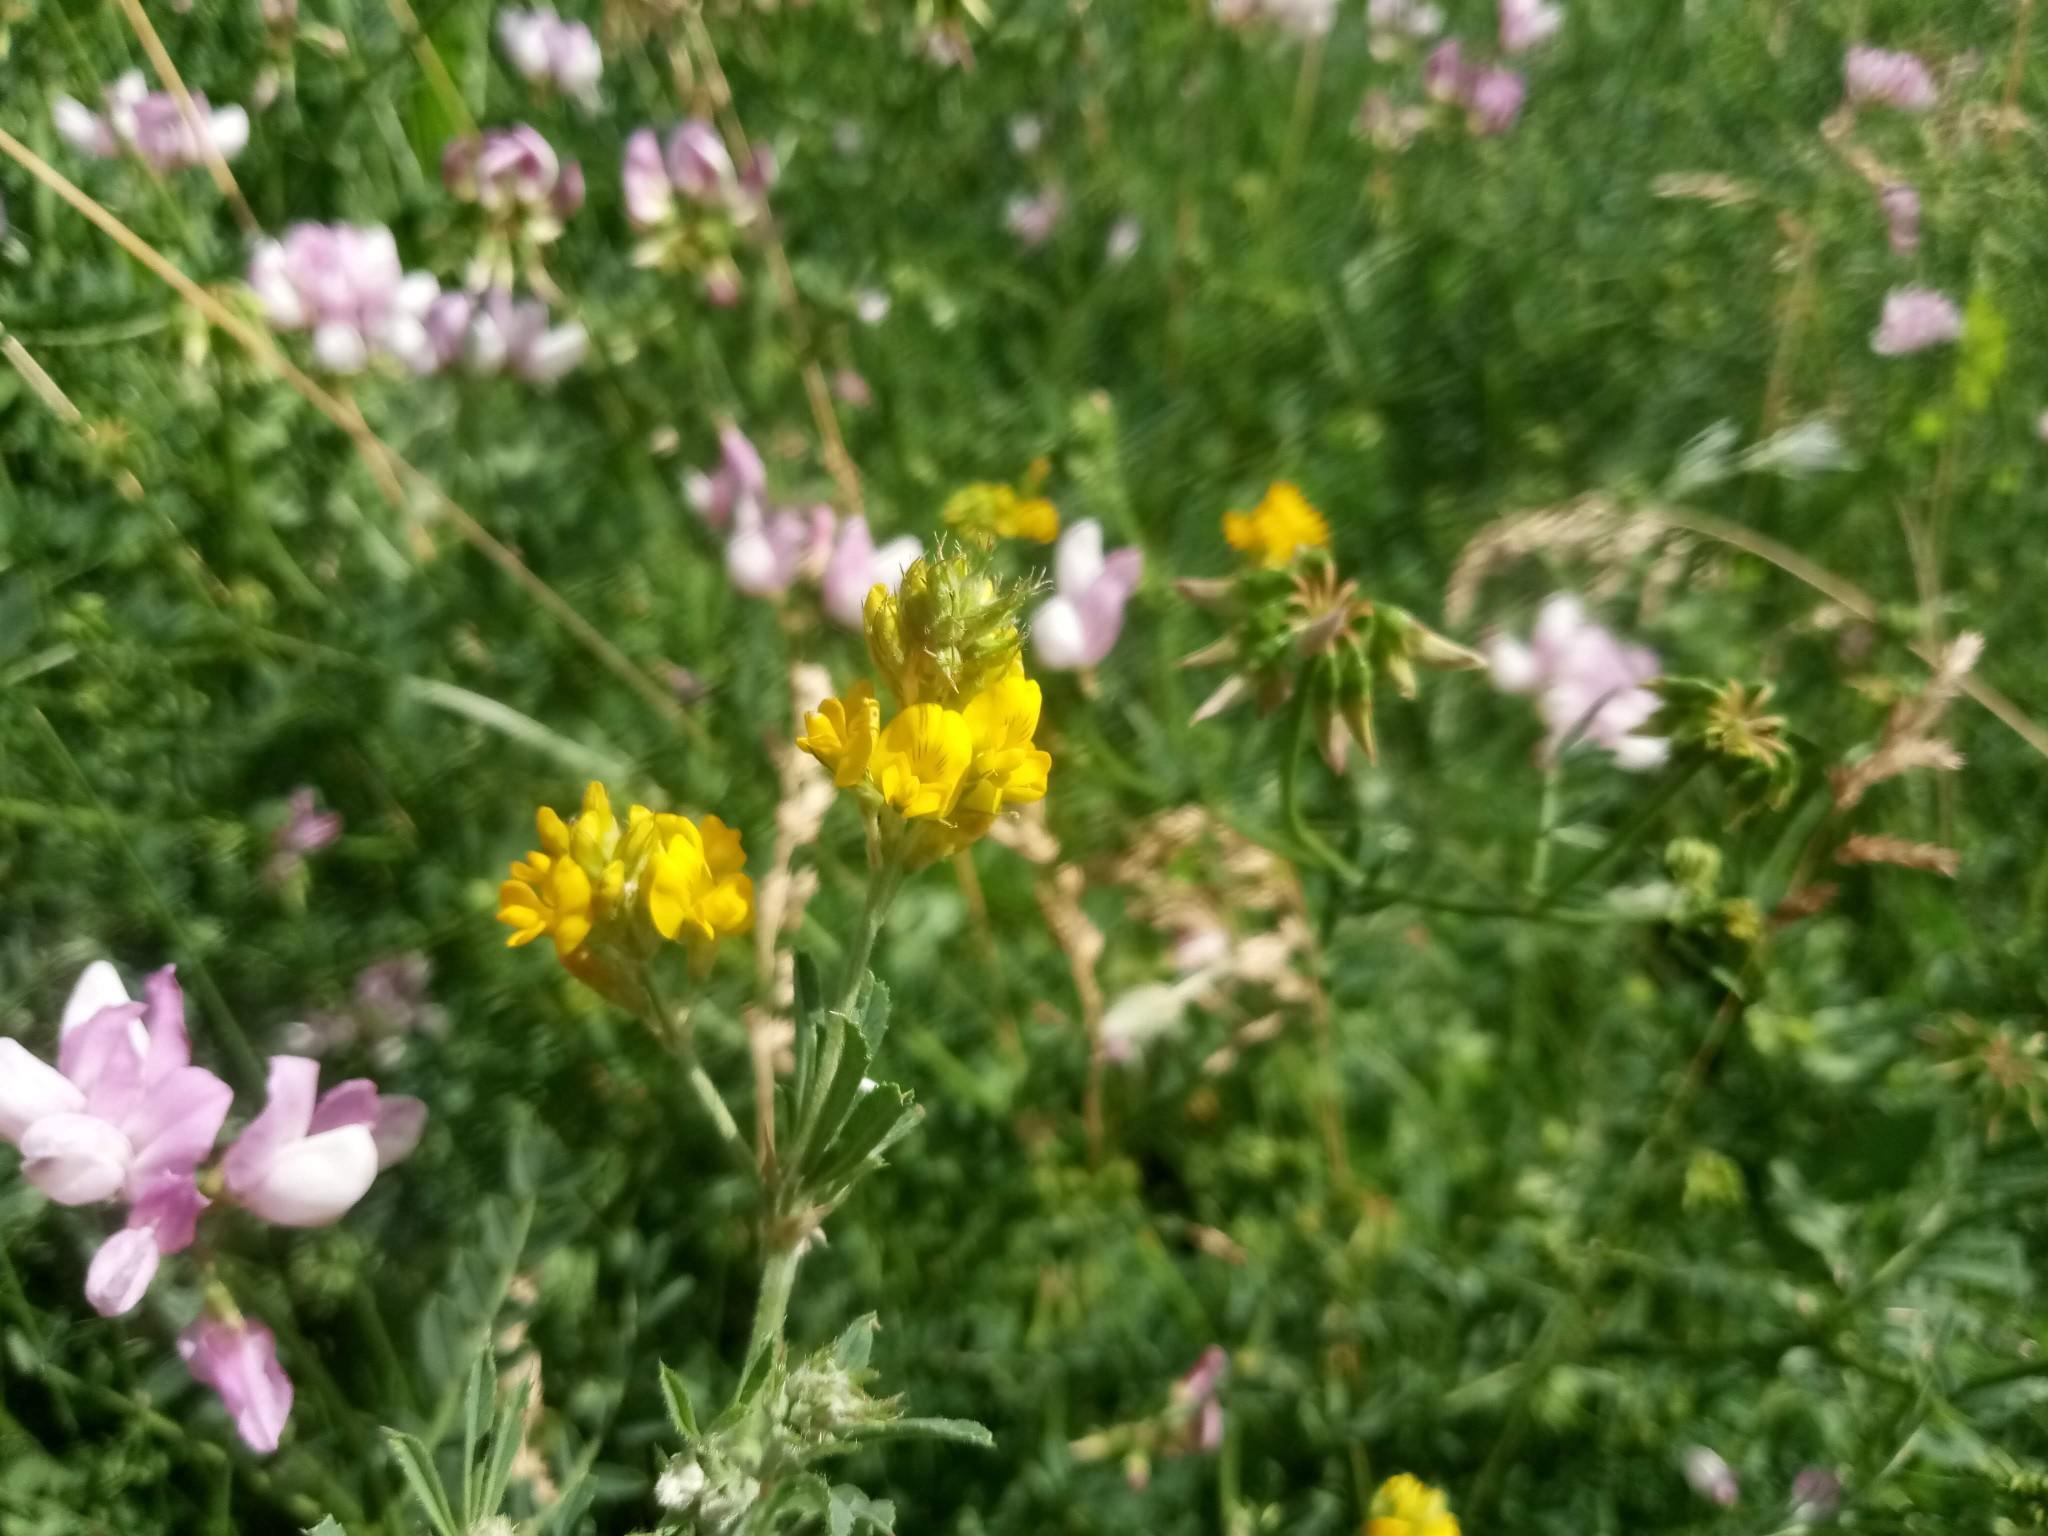 Summer flowers photo